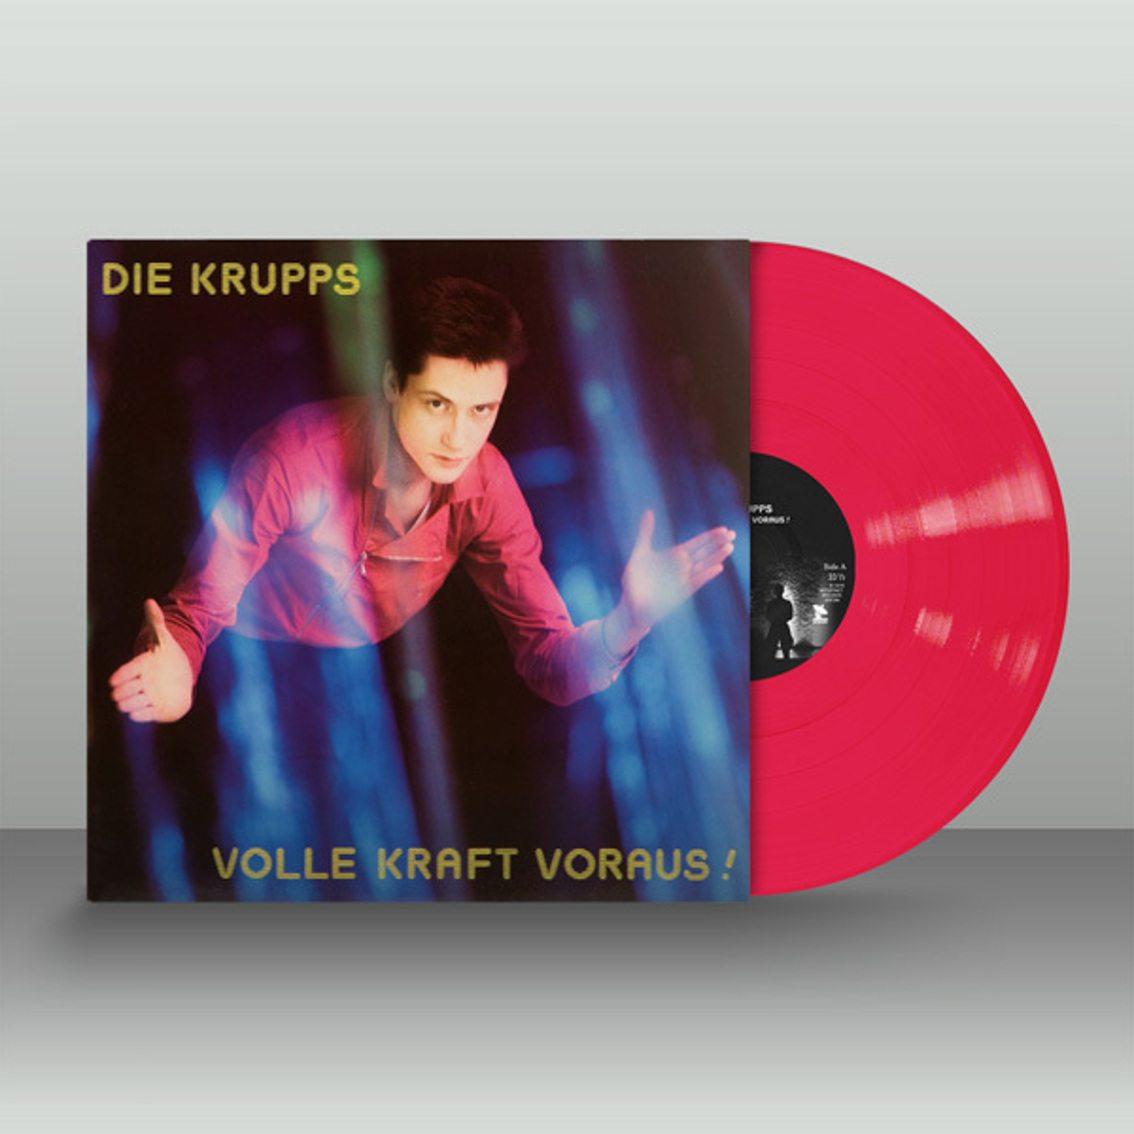 Die Krupps'Volle Kraft Voraus' gets vinyl treatment including... pink!